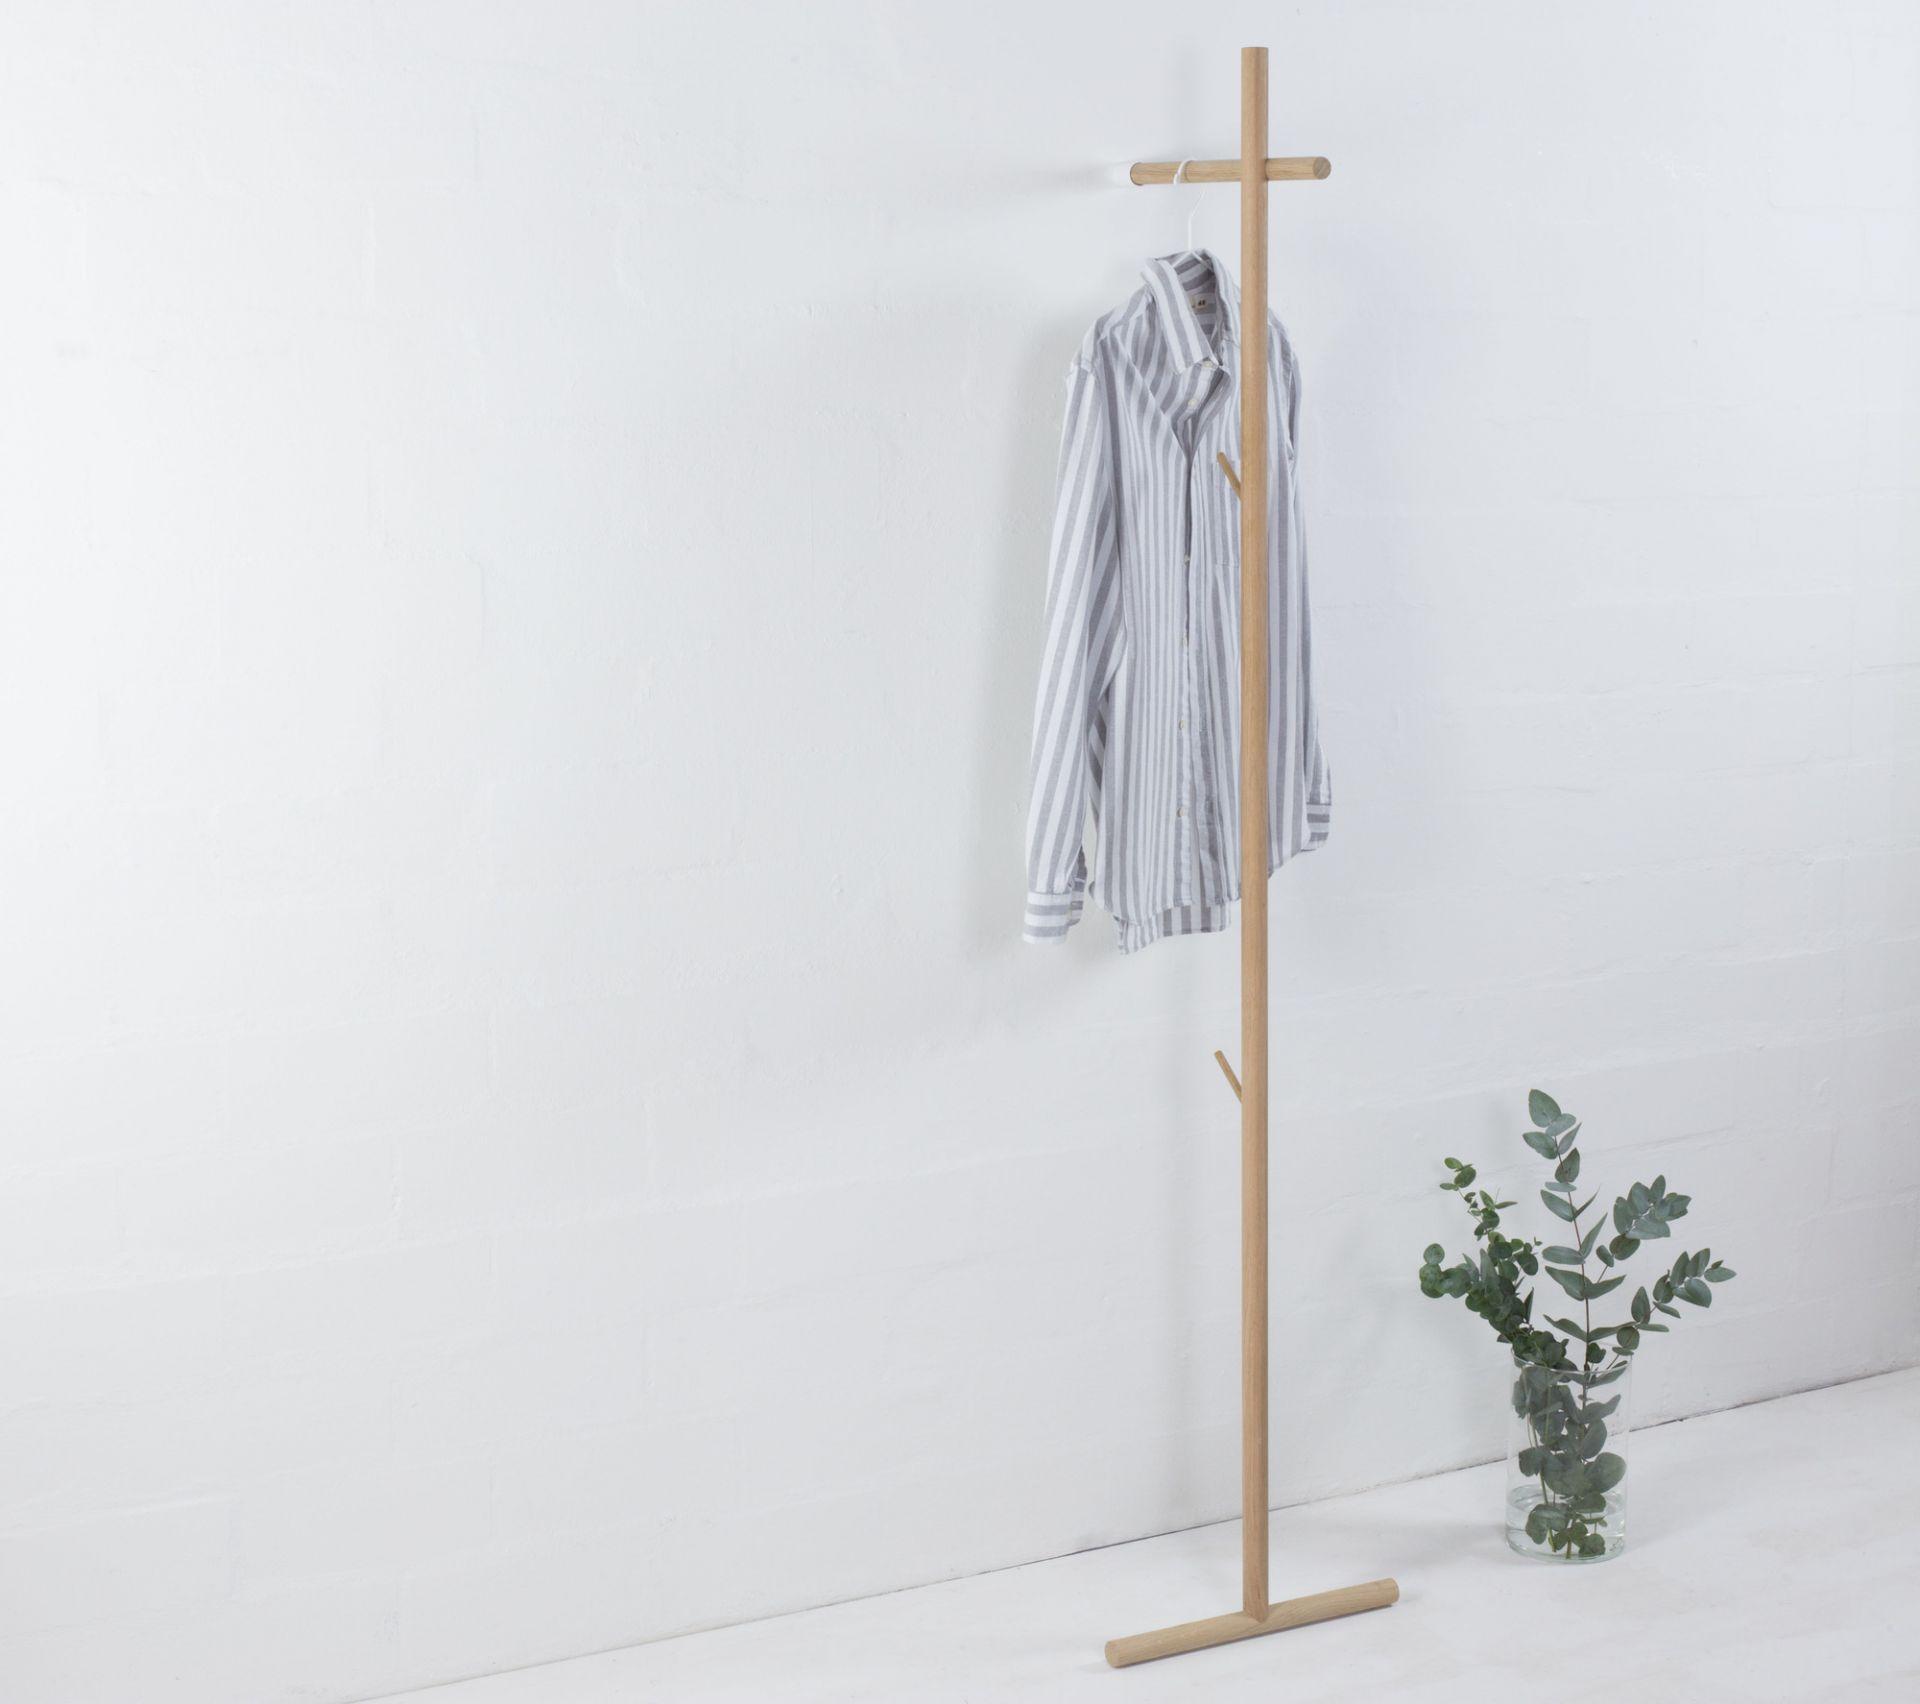 Stekka Wardrobe Kommod